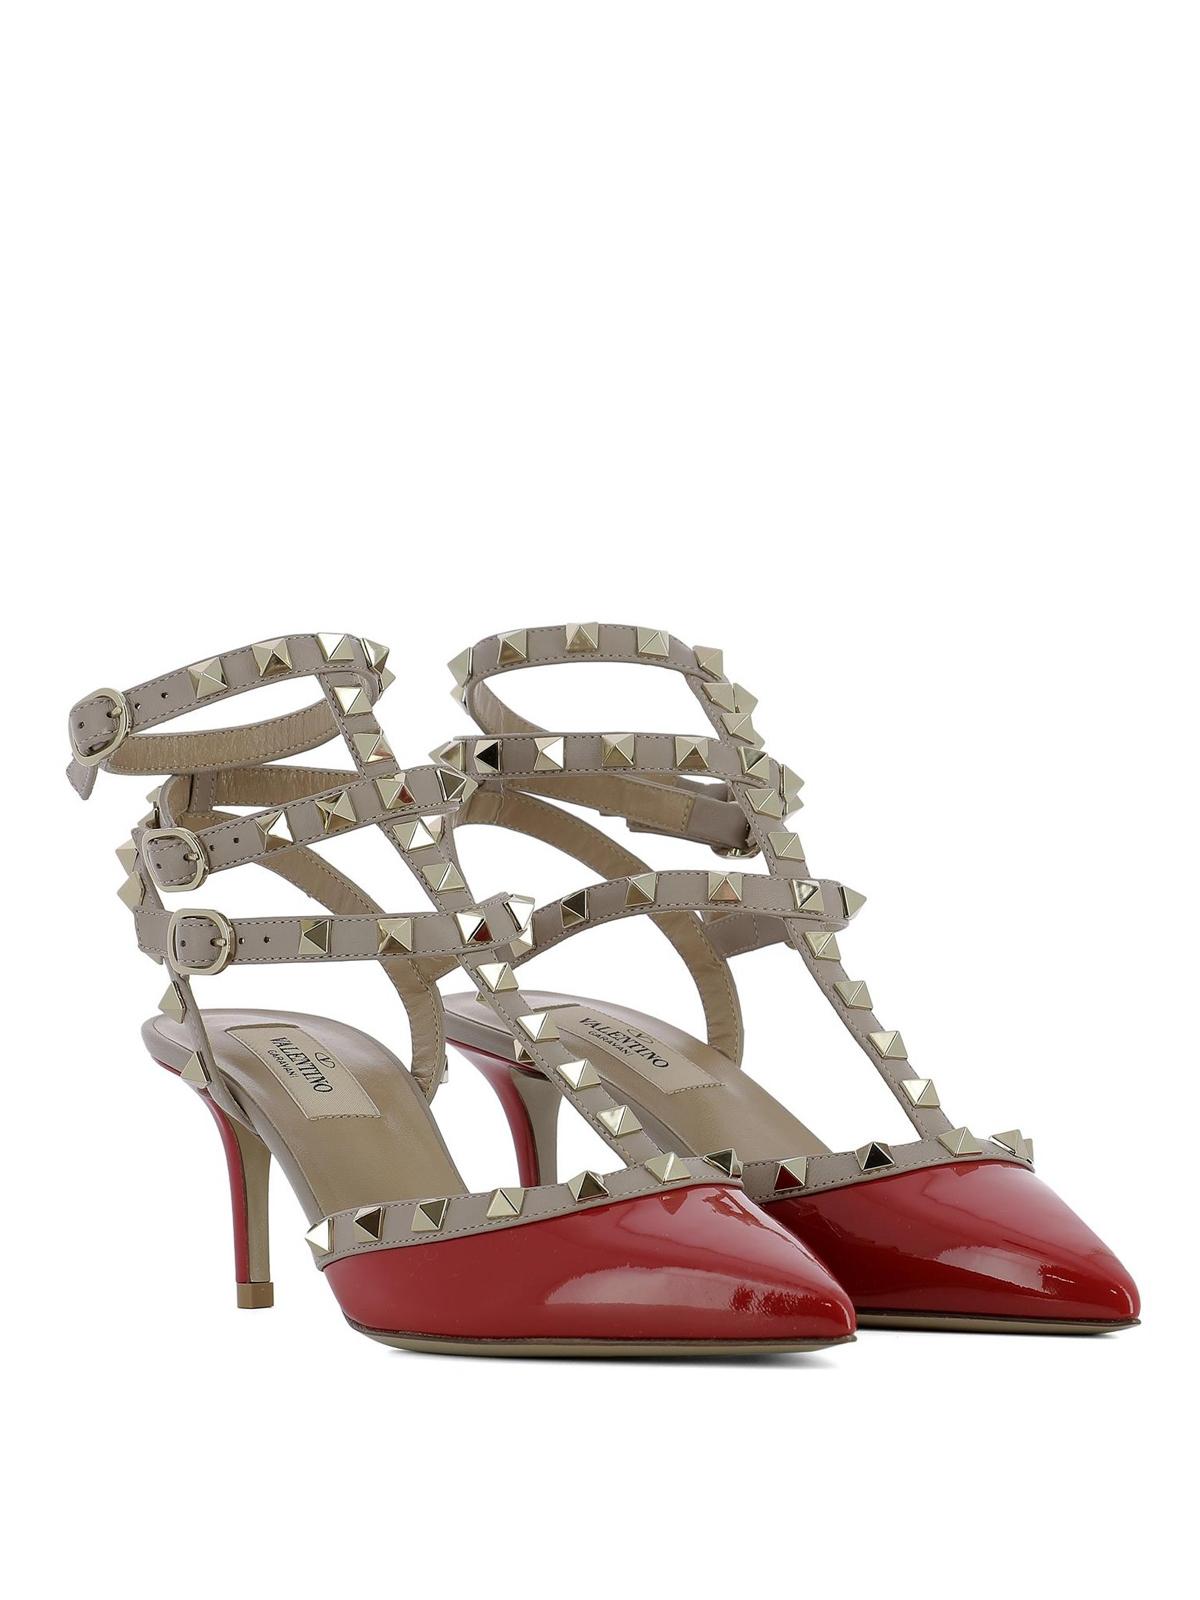 0998726200f VALENTINO GARAVANI  court shoes online - Rockstud red patent leather sandals